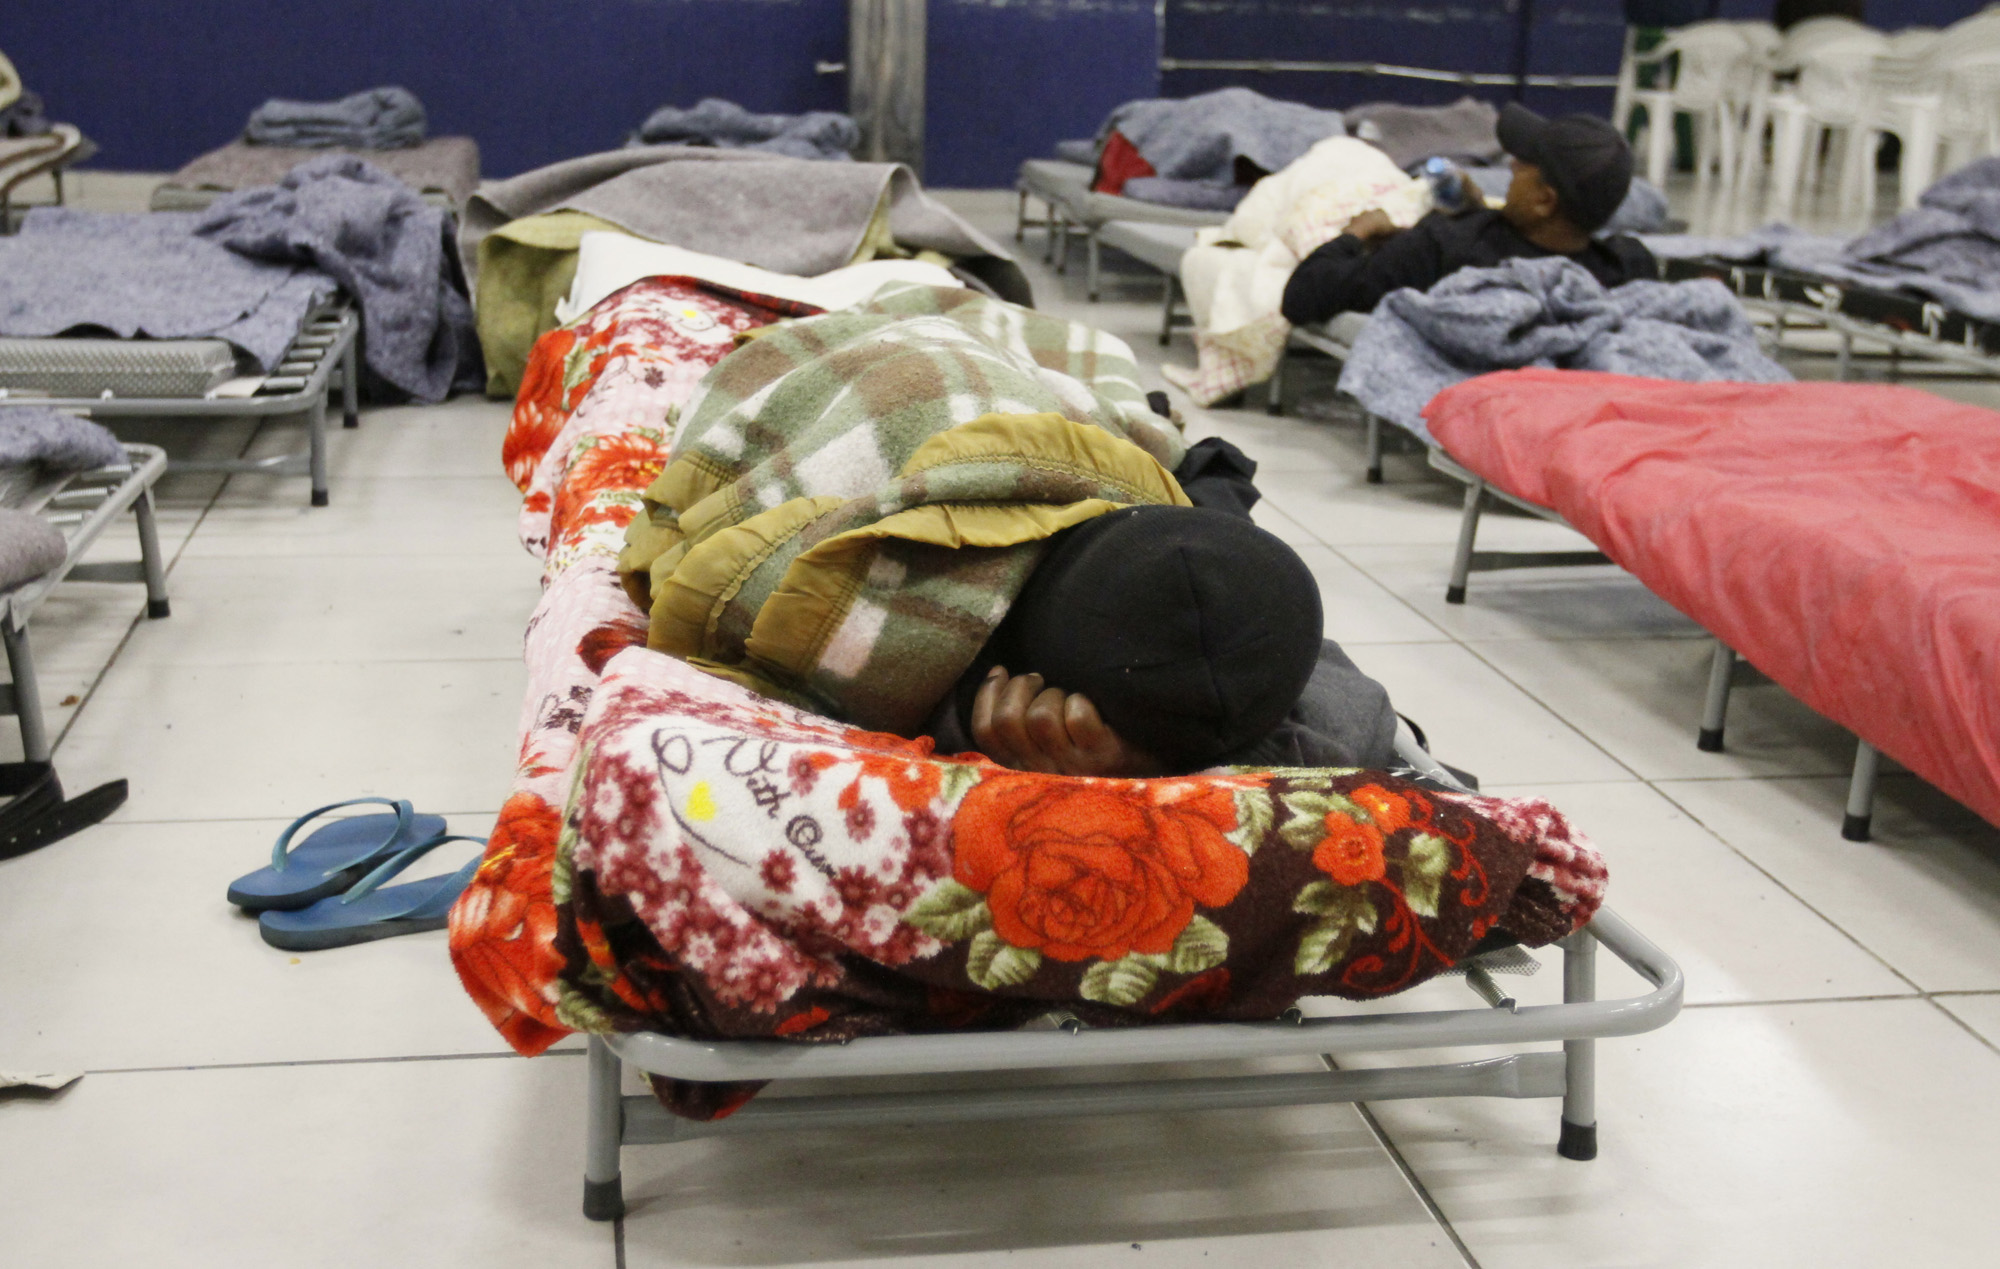 onde doar cobertores